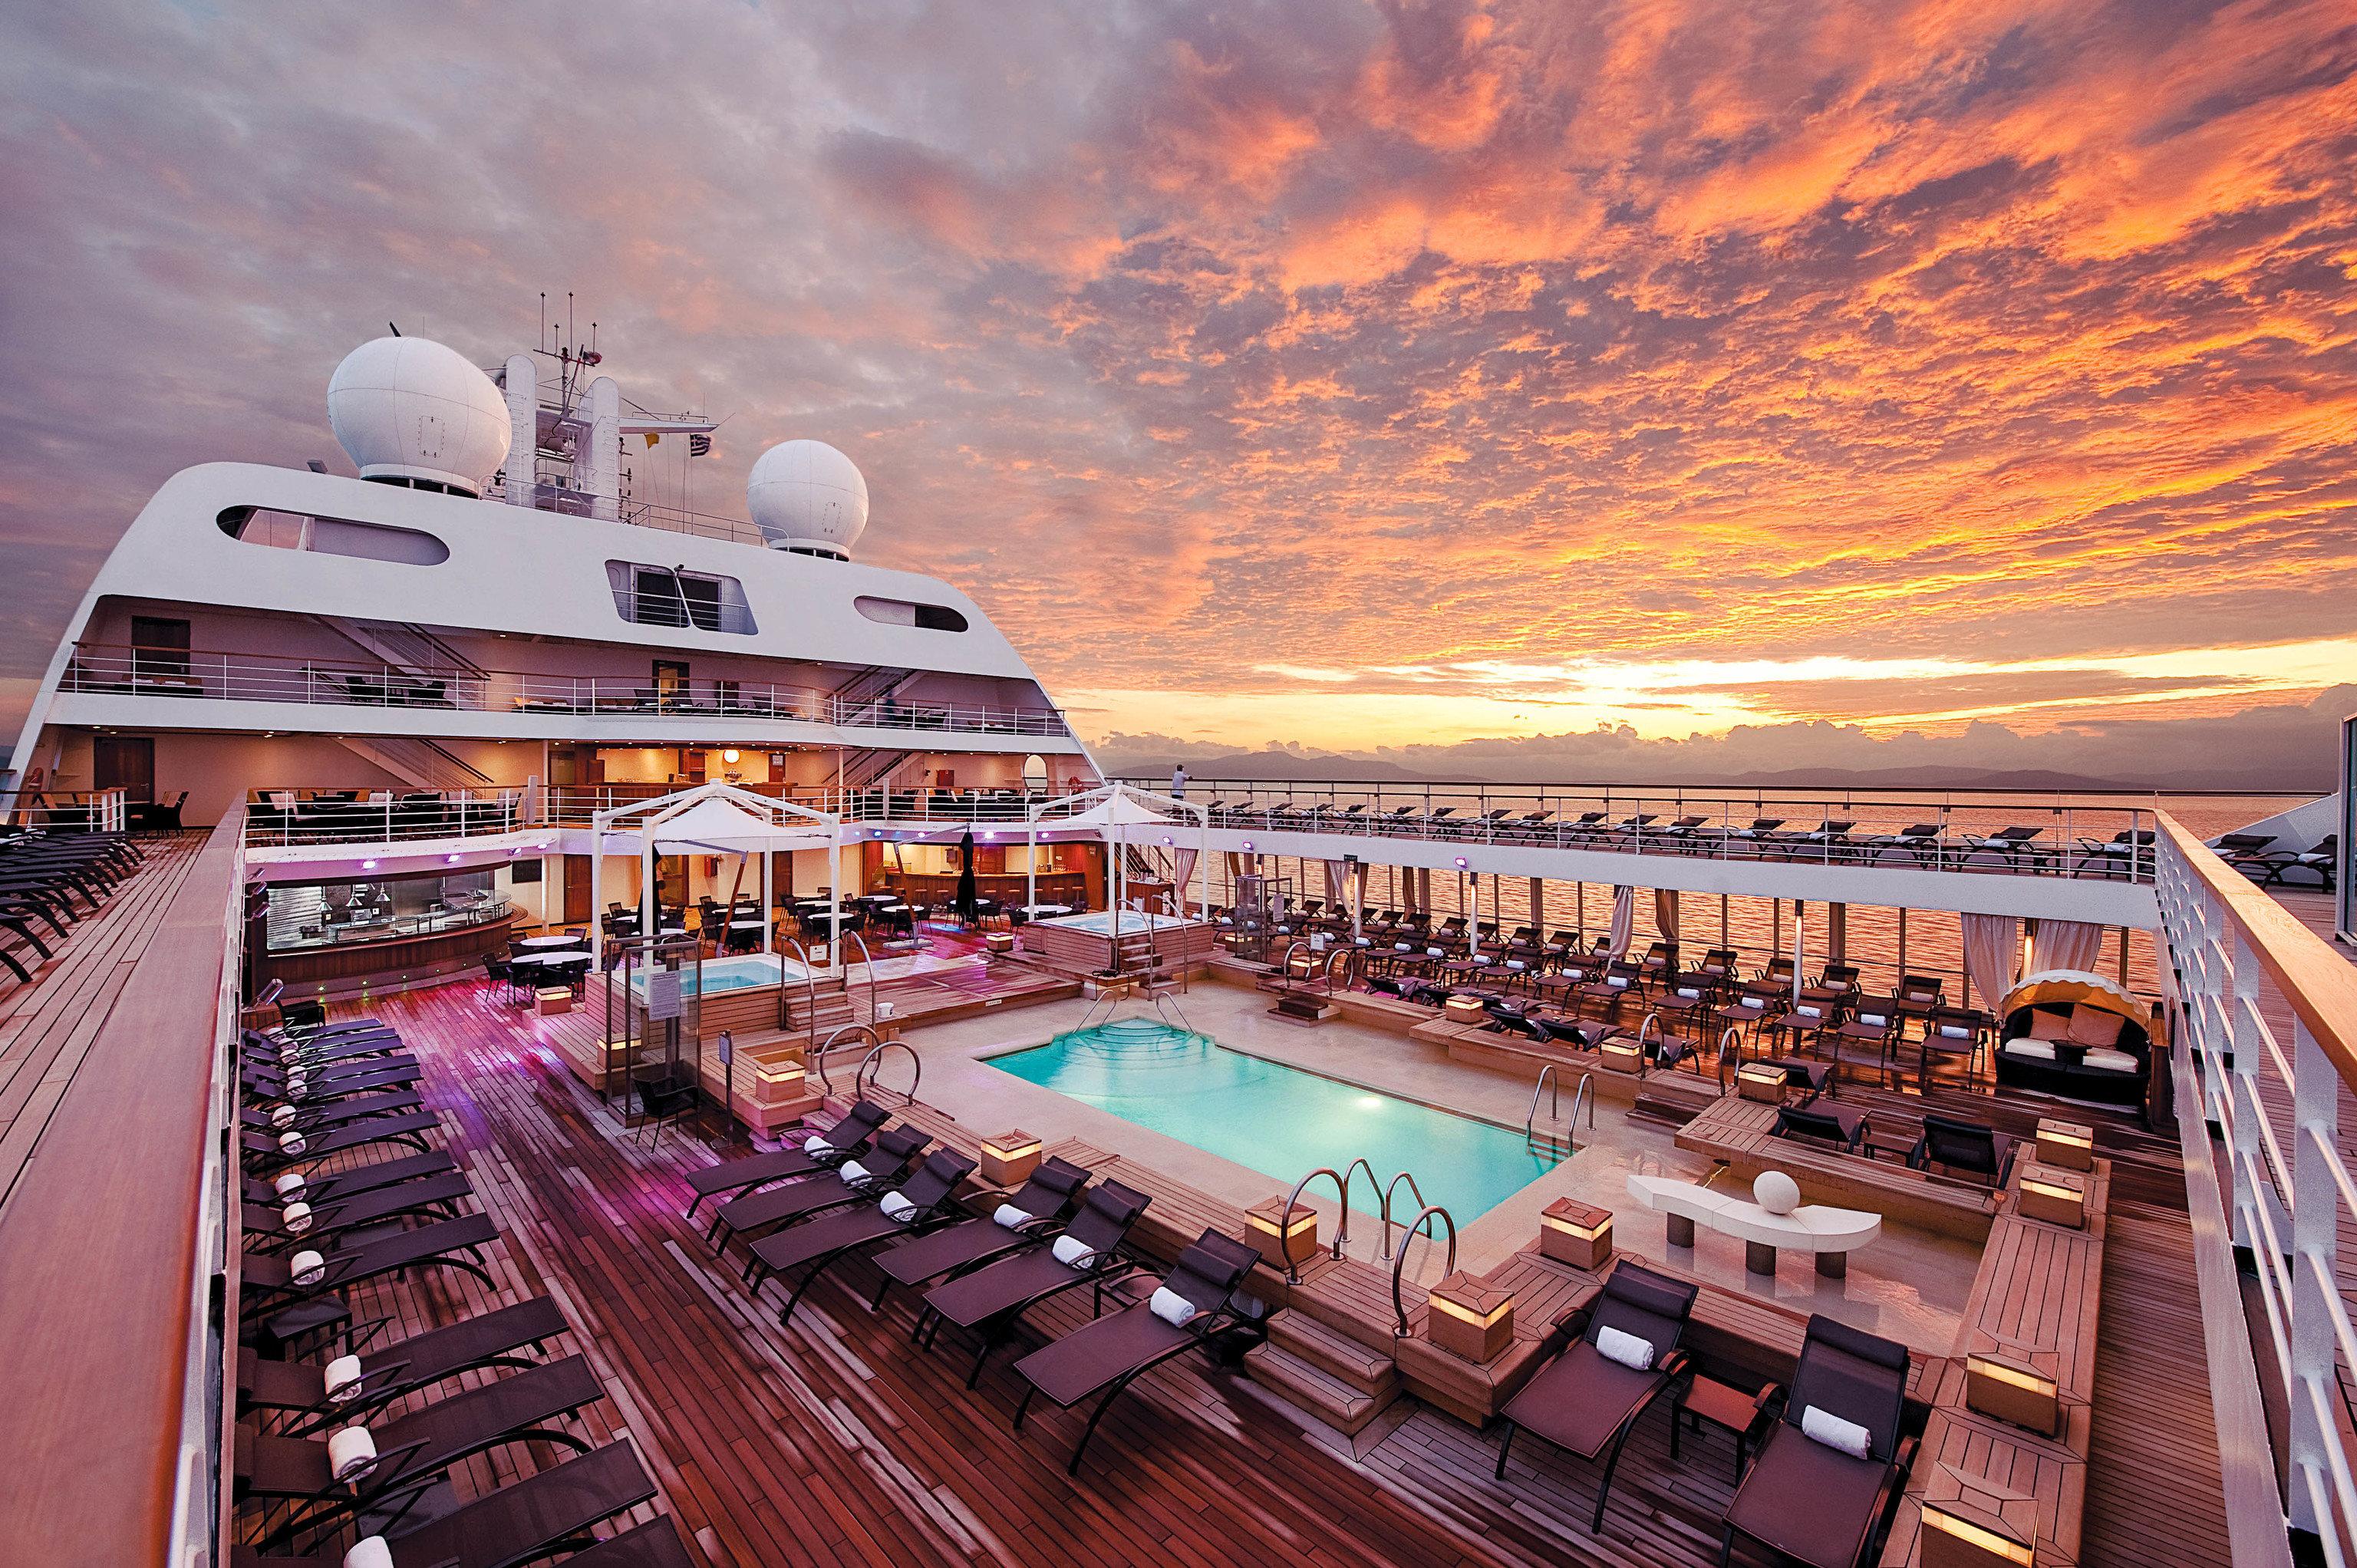 Cruise Travel Luxury Travel Trip Ideas outdoor passenger ship cruise ship ship water transportation watercraft vehicle evening luxury yacht sky leisure yacht